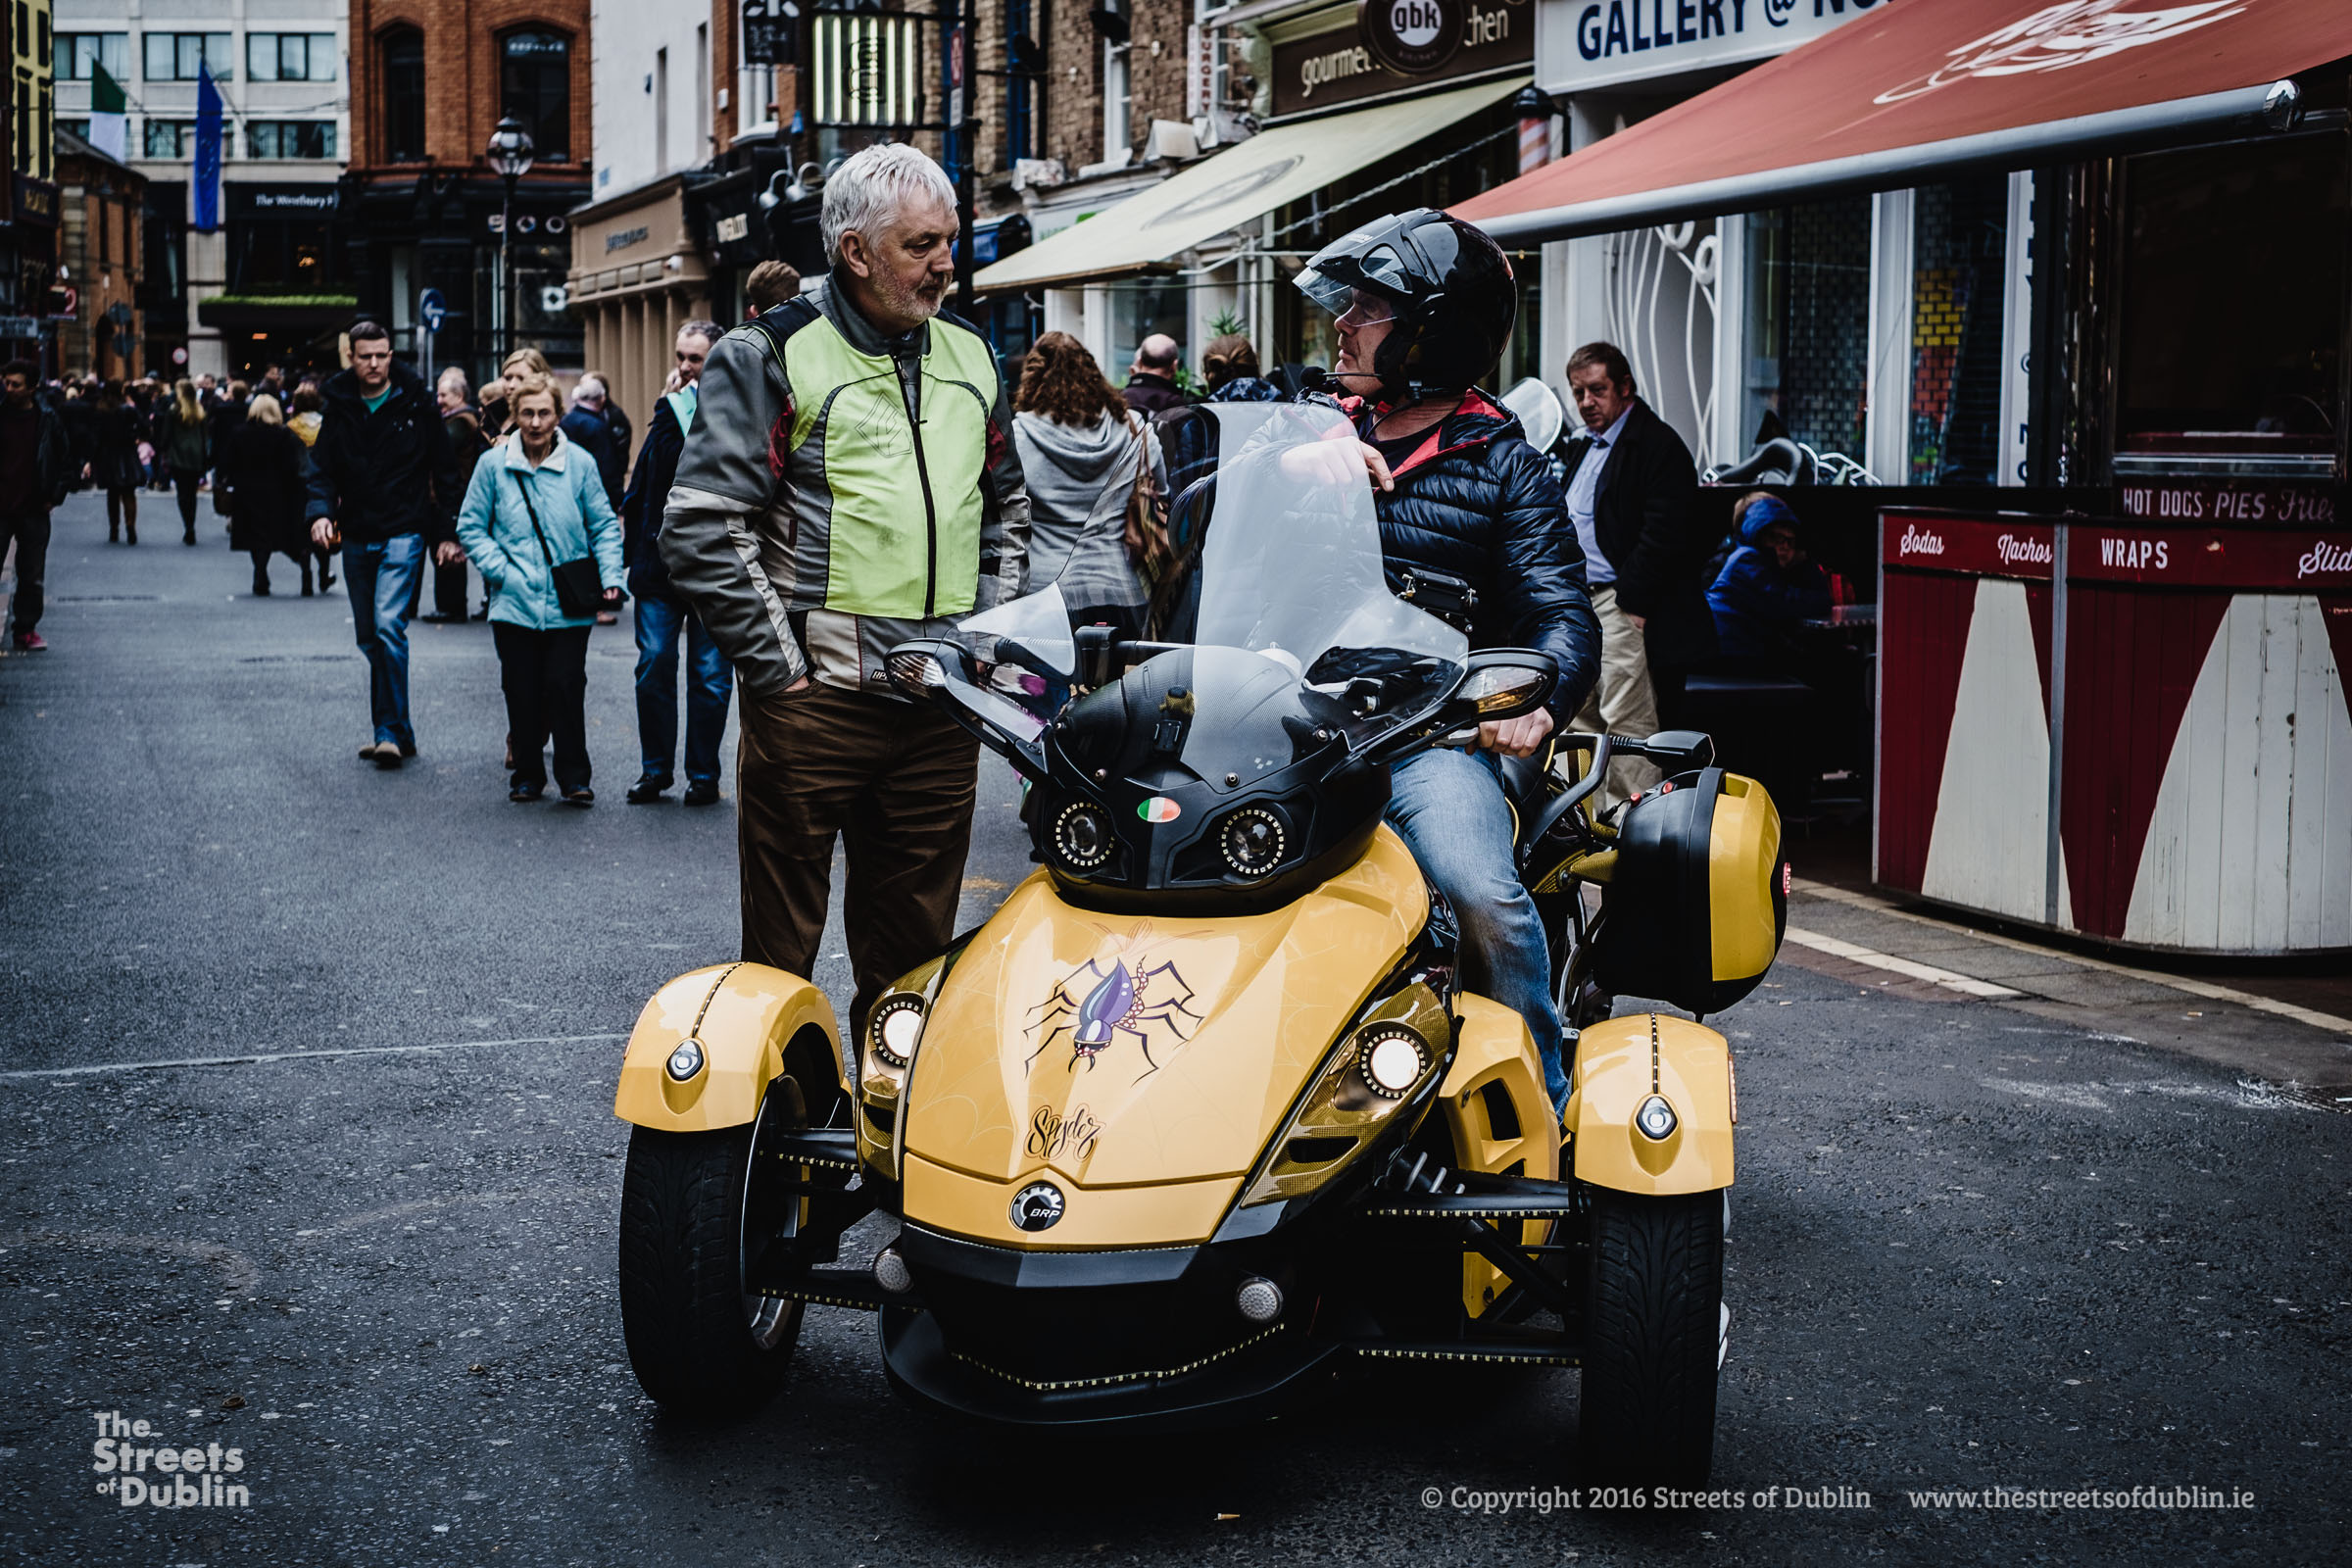 Streets-of-Dublin-Photo-2010.jpg